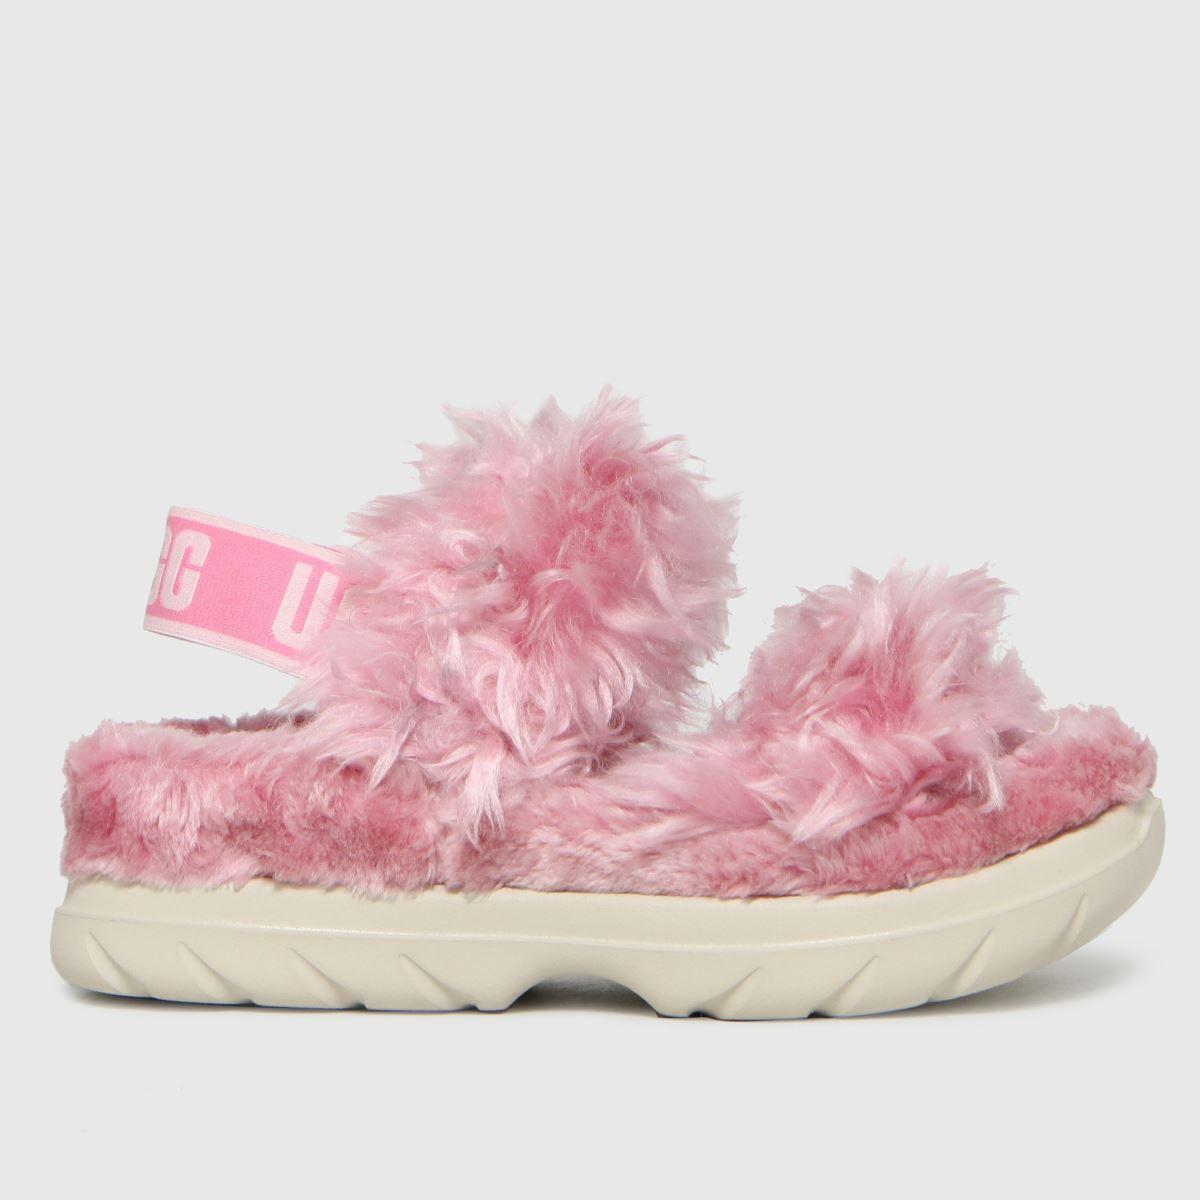 UGG Pink Fluff Sugar Slippers